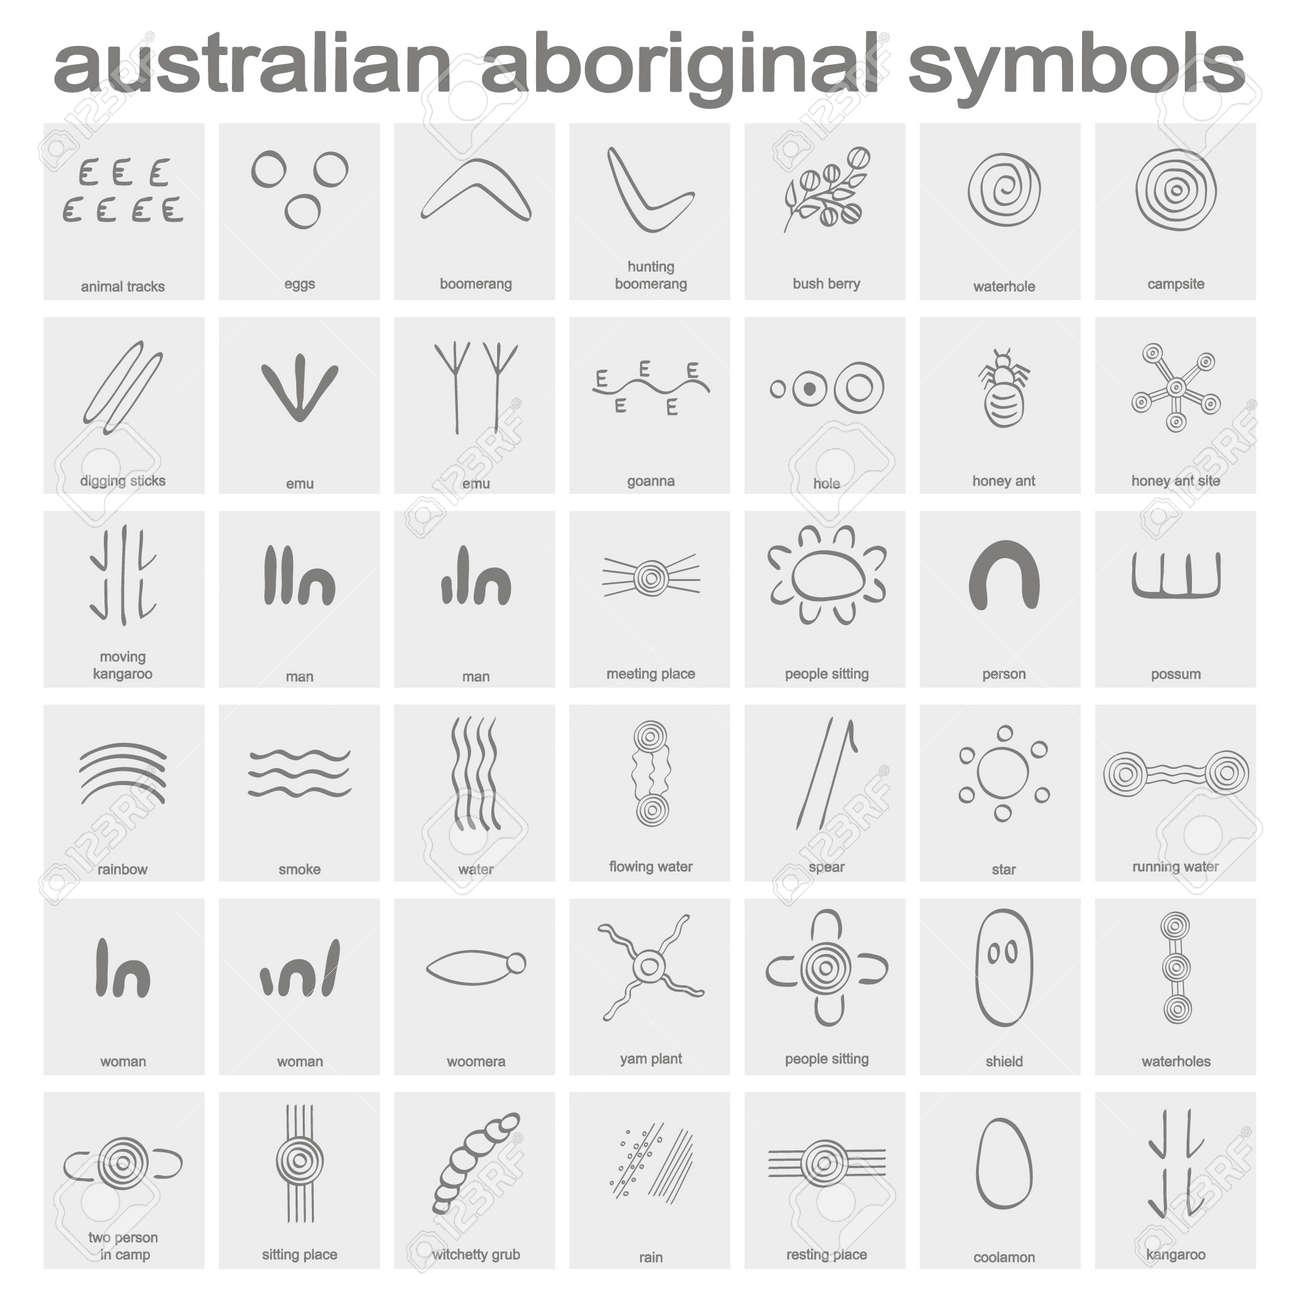 monochrome icon set with australian aboriginal symbols for your design - 115602378